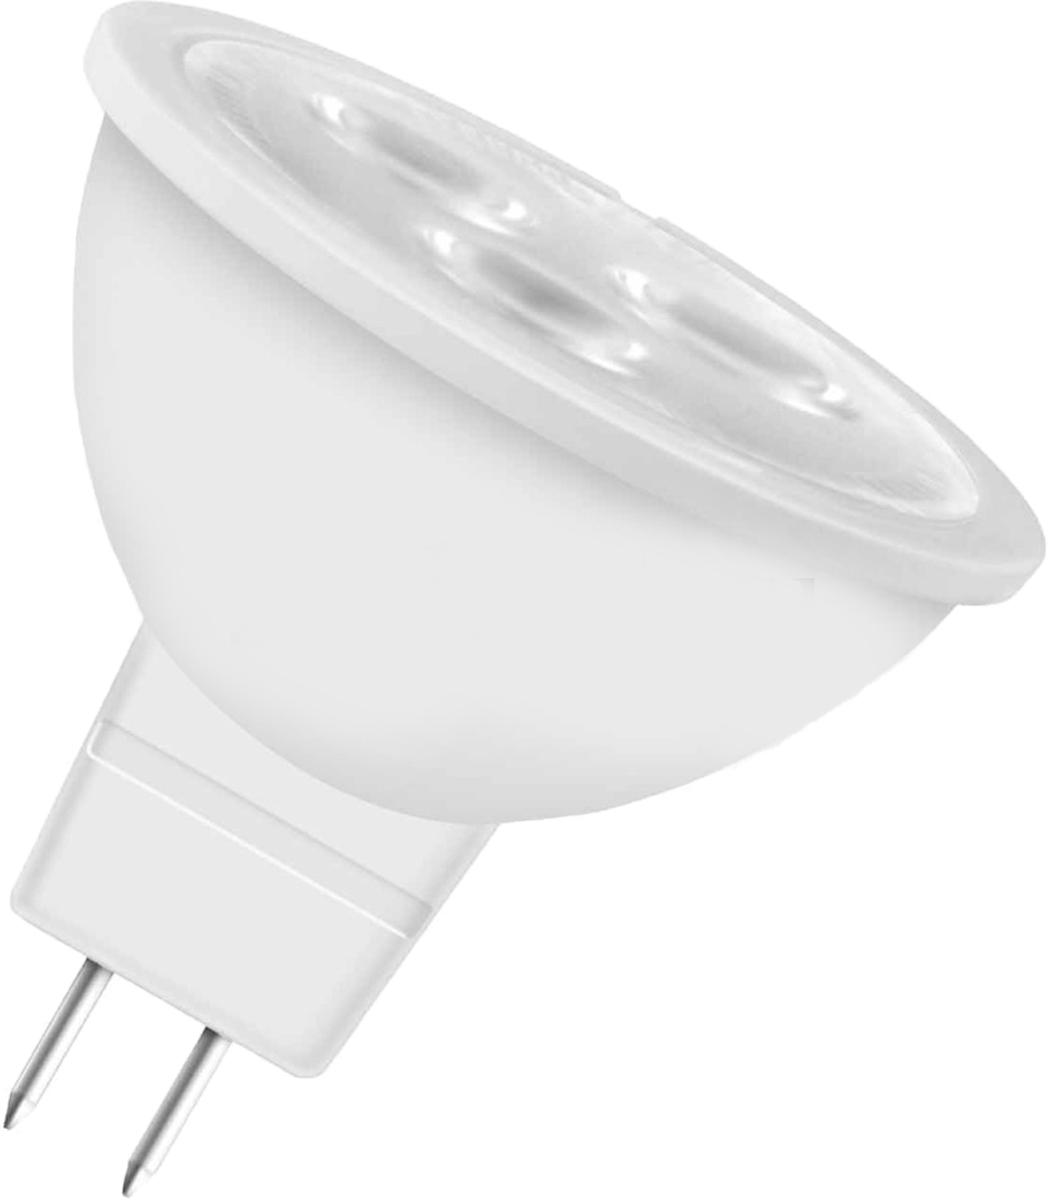 "Лампа светодиодная Osram ""Star MR"" 16 20 3.8W/827 220-240V GU5.3. 4052899237483"